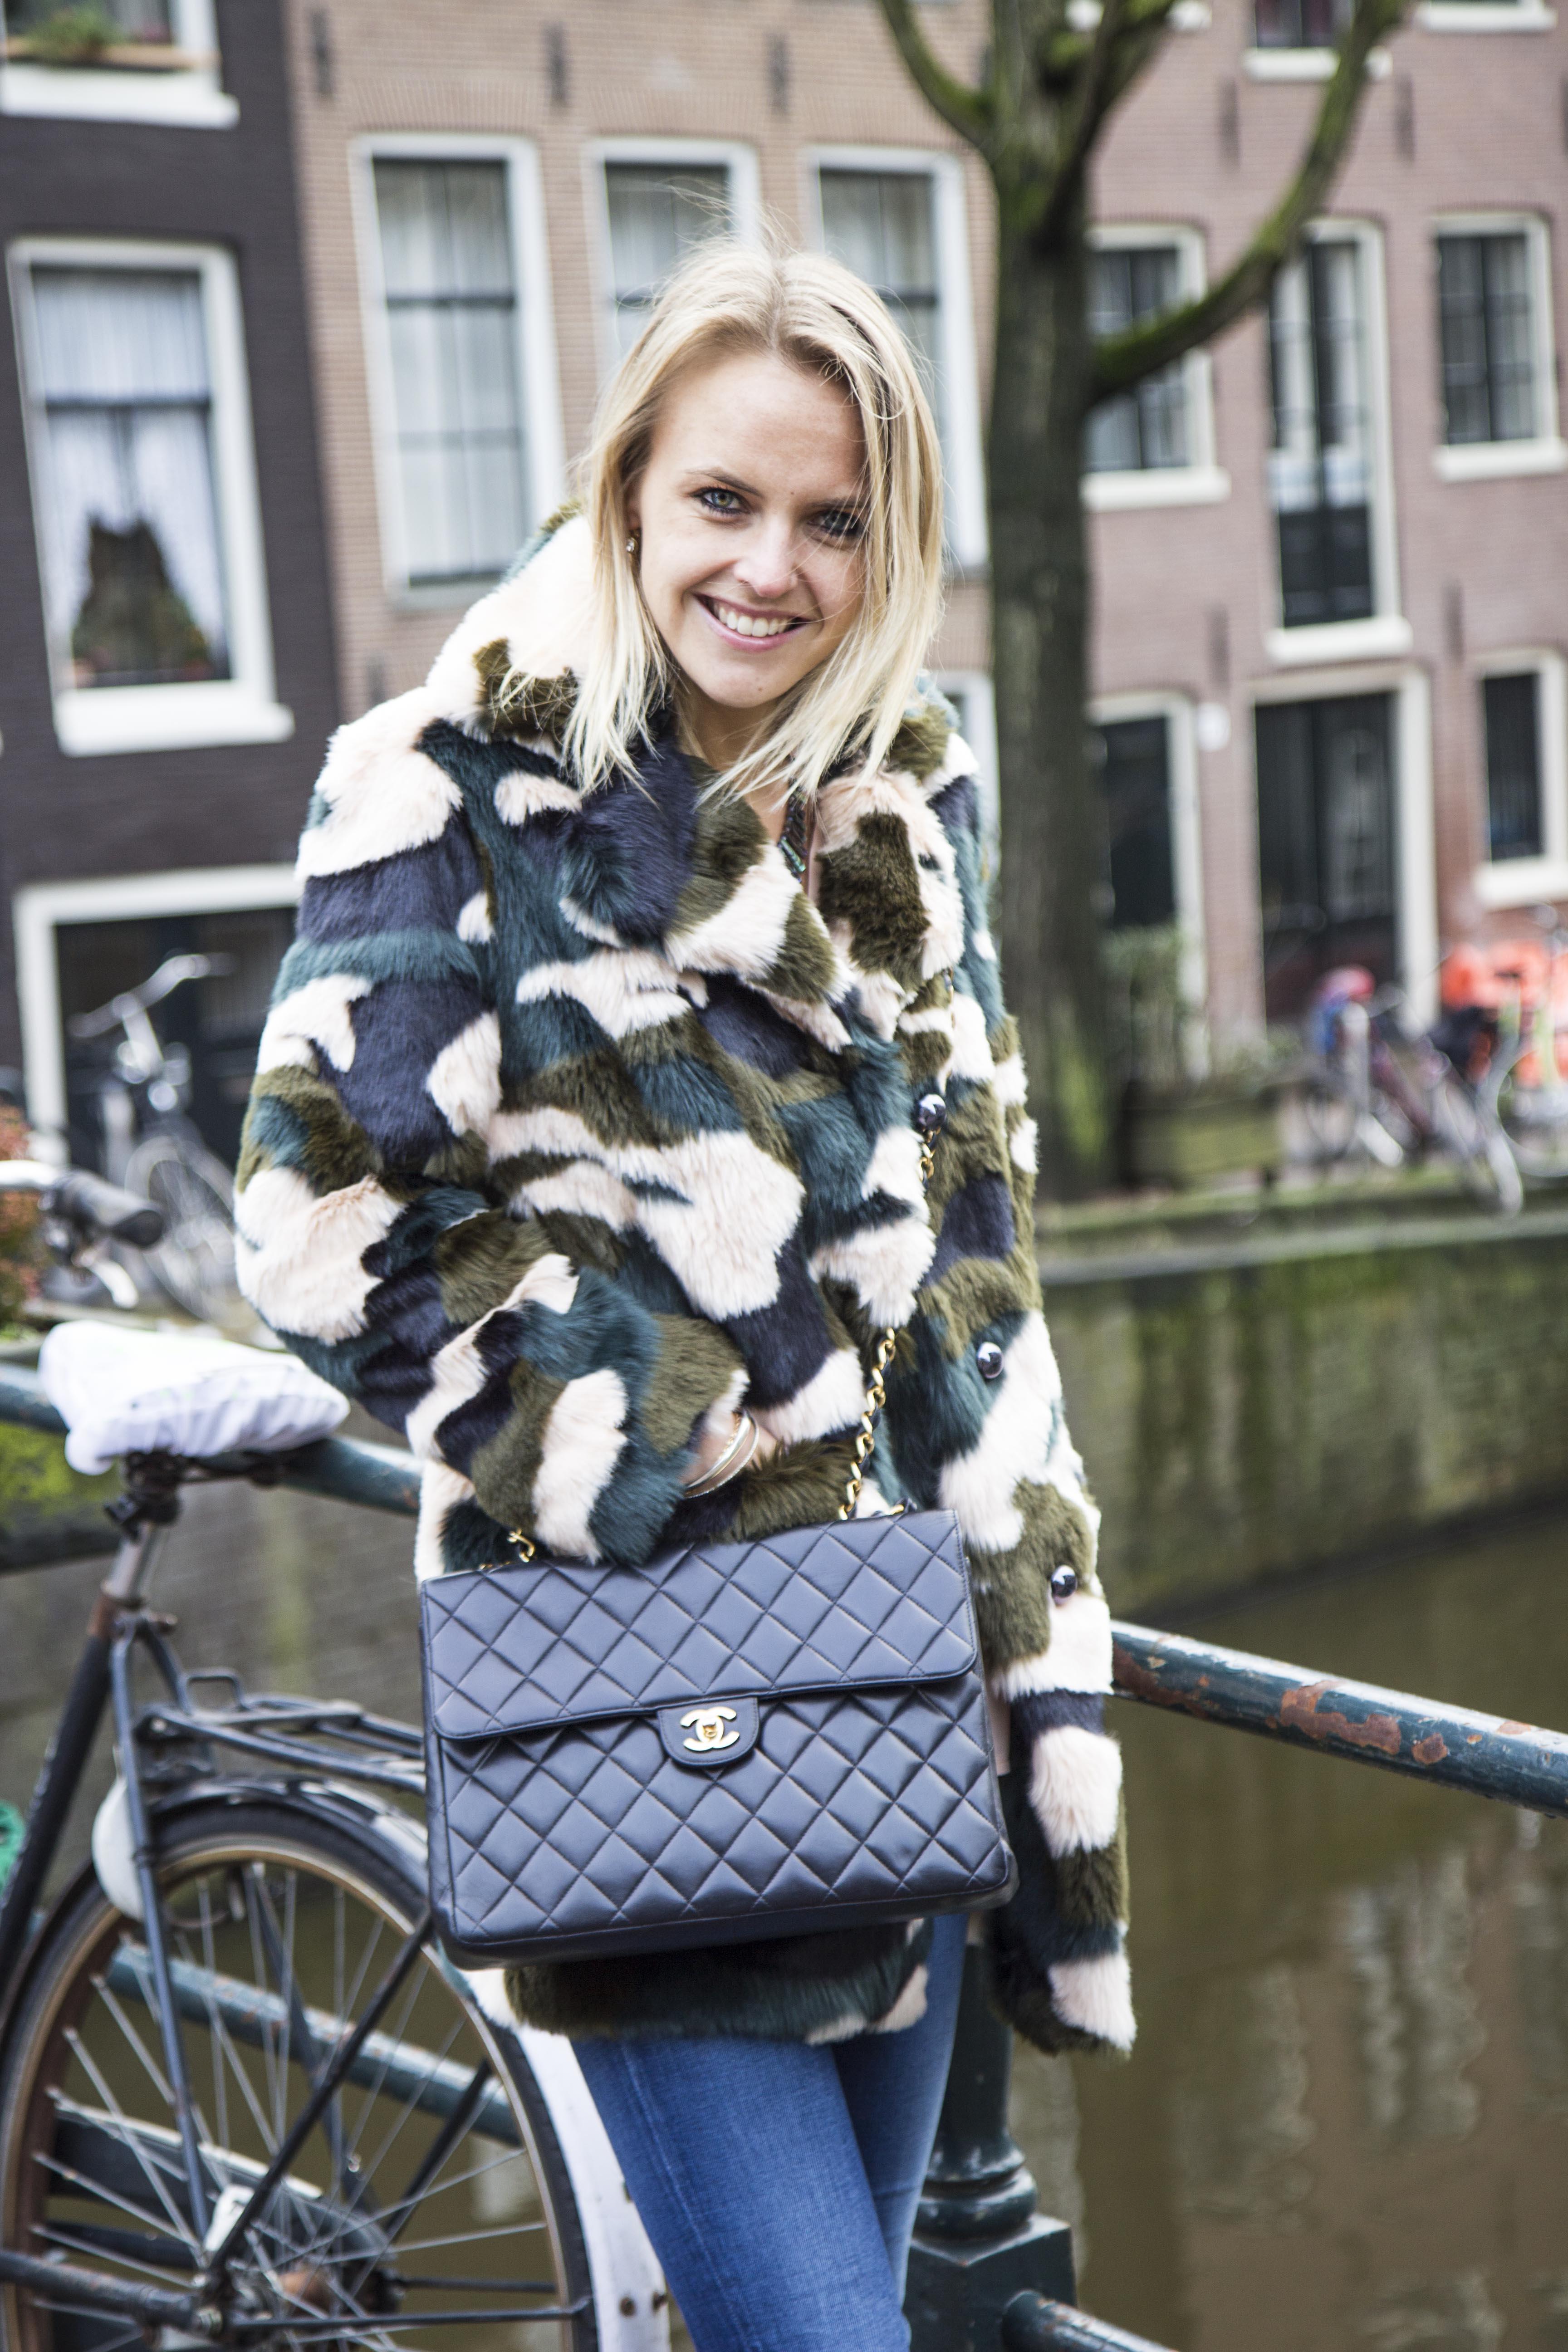 Bag at You - Chanel Smile